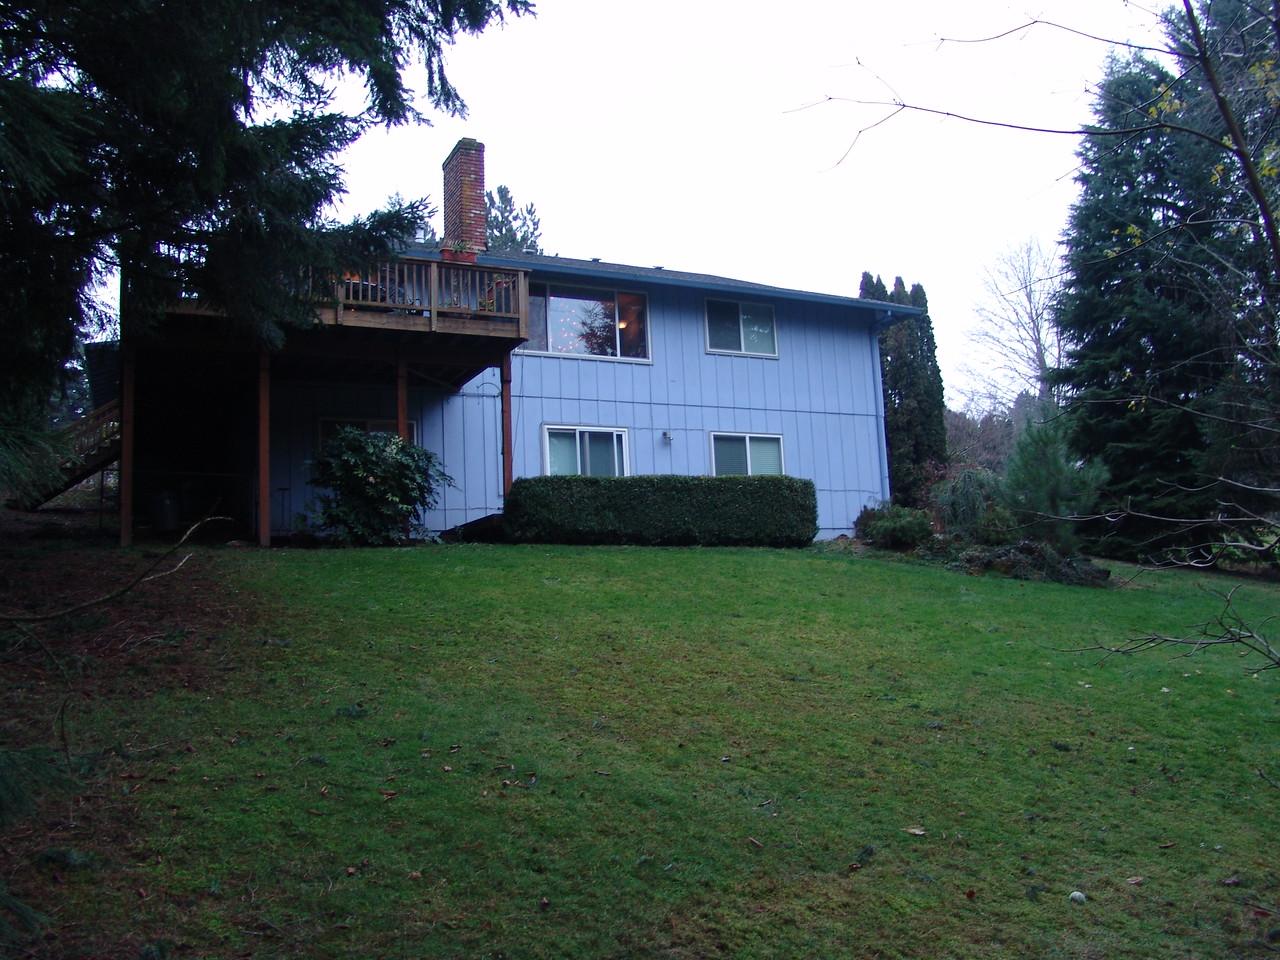 MY HOUSE AND BACKYARD